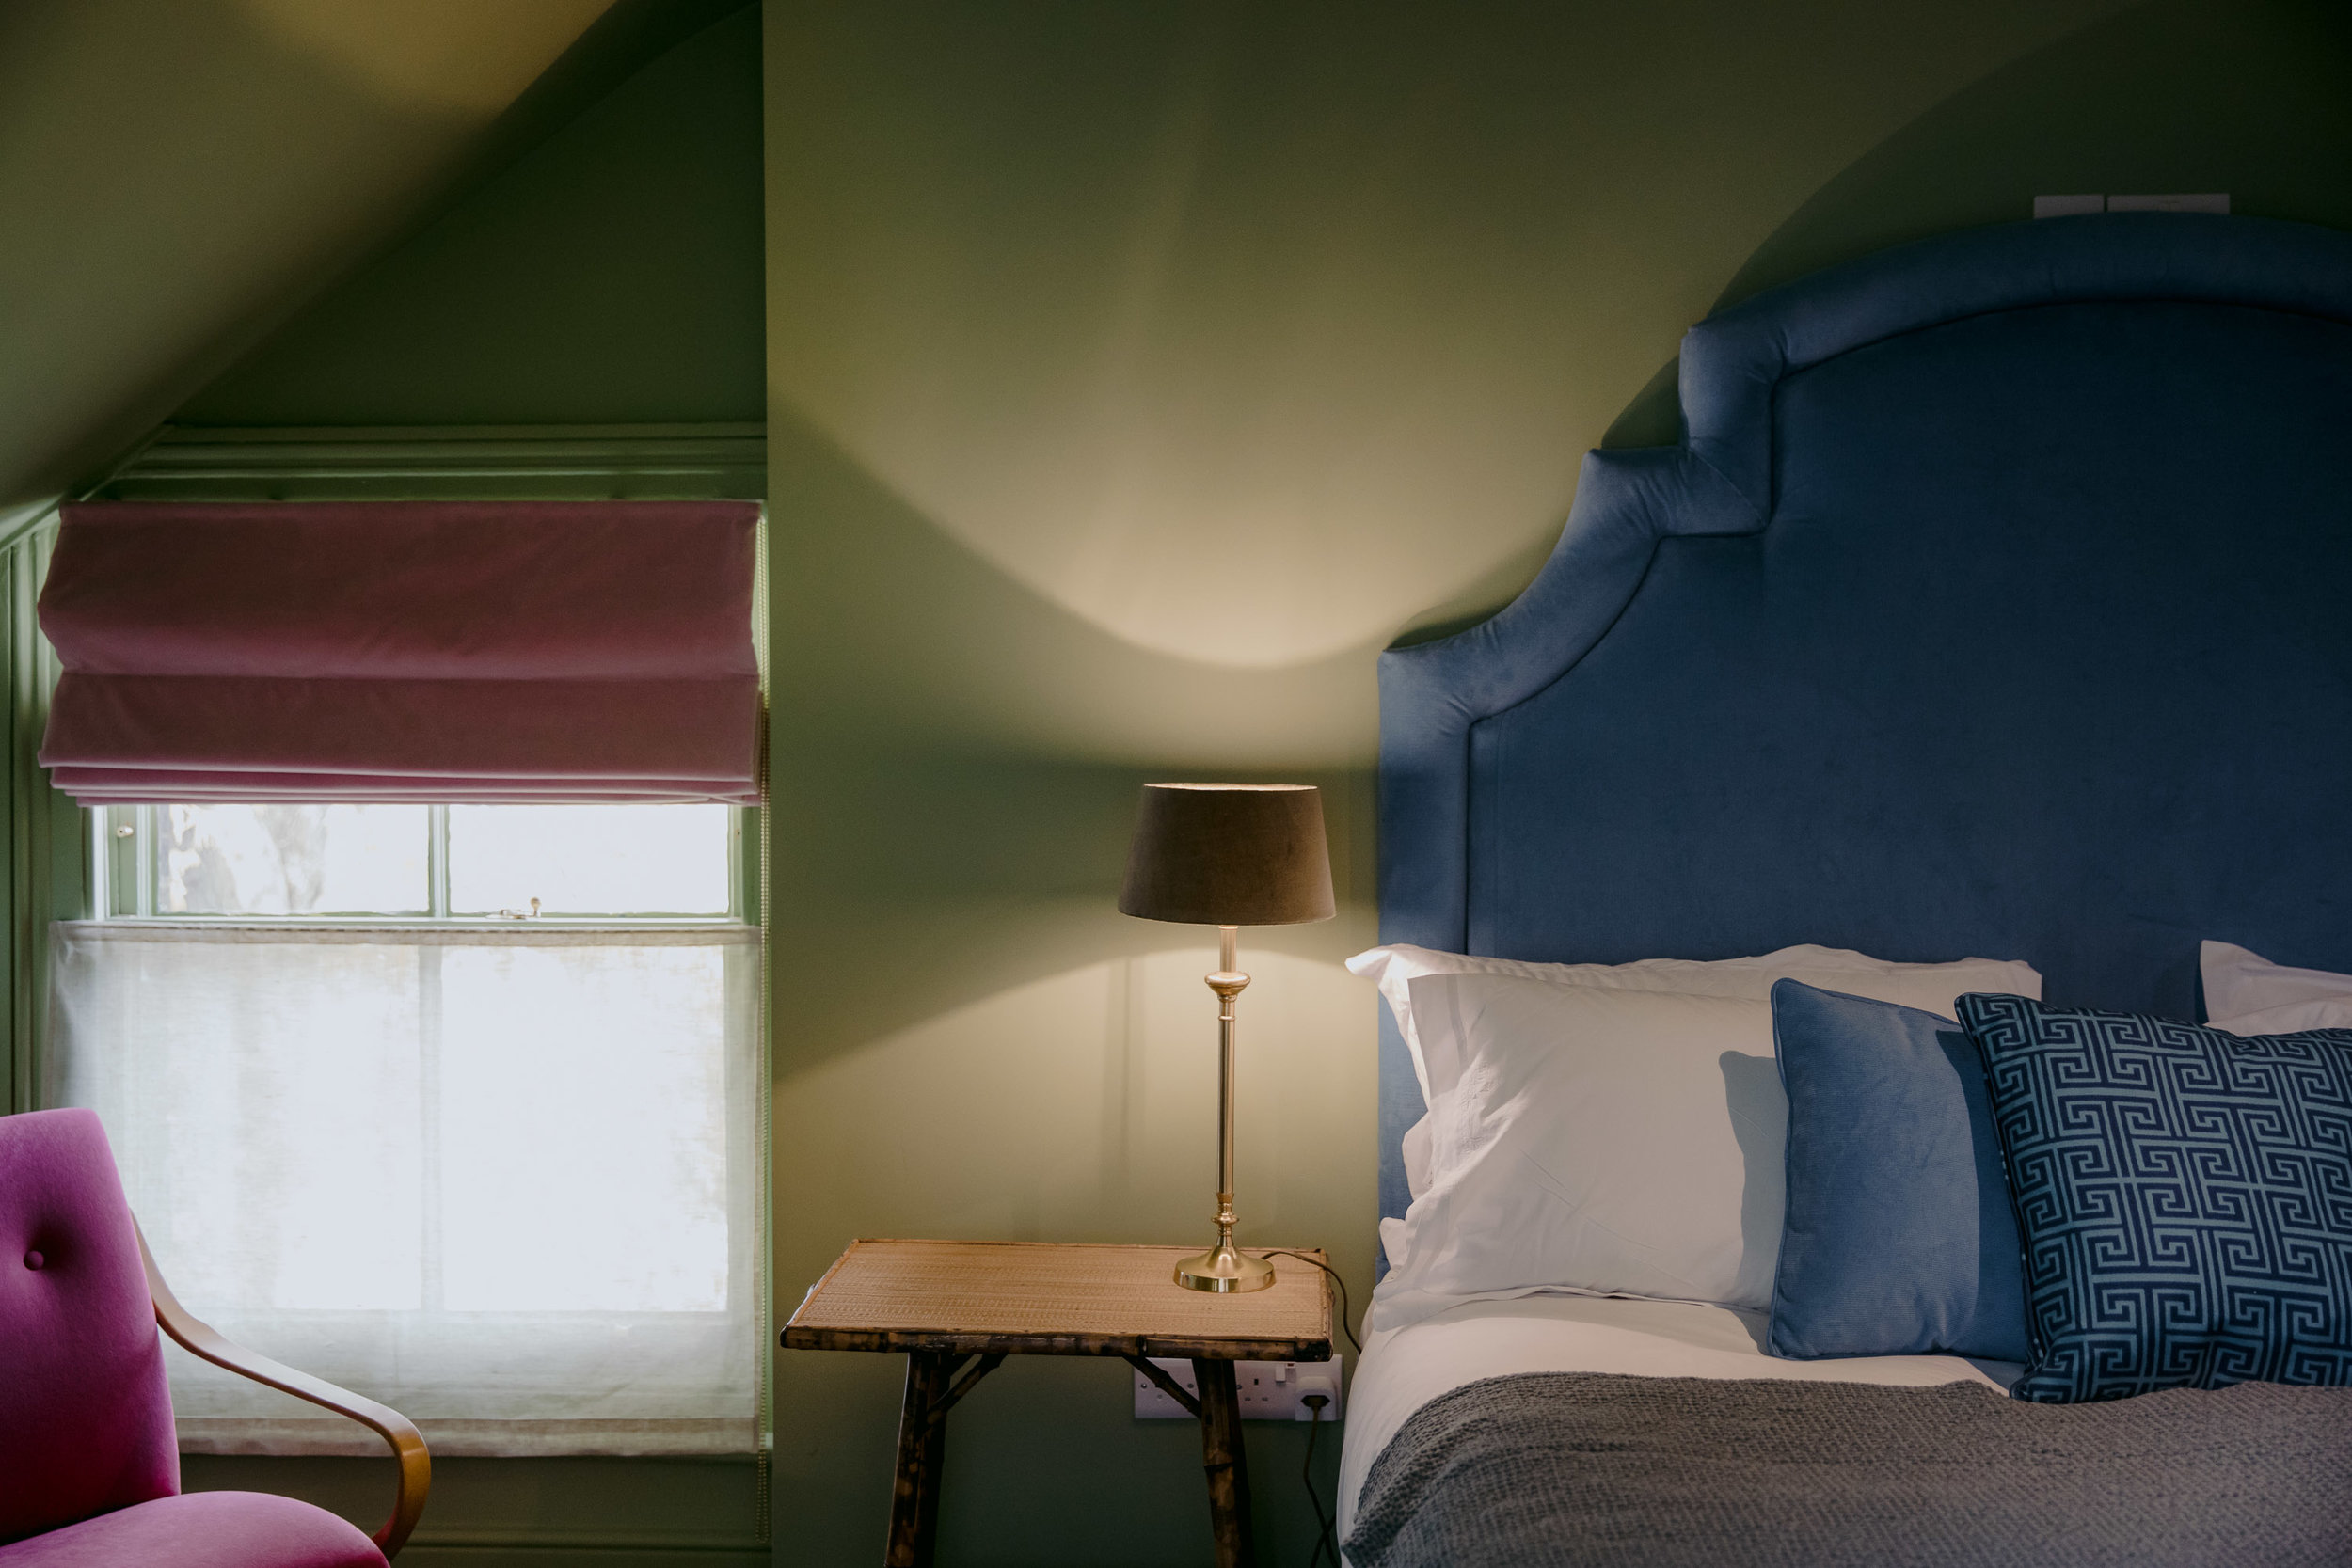 deal-hotel-the-rose-kent-coast-interior-design-support-local-magazine-styling-refurb-1-60fd.jpg